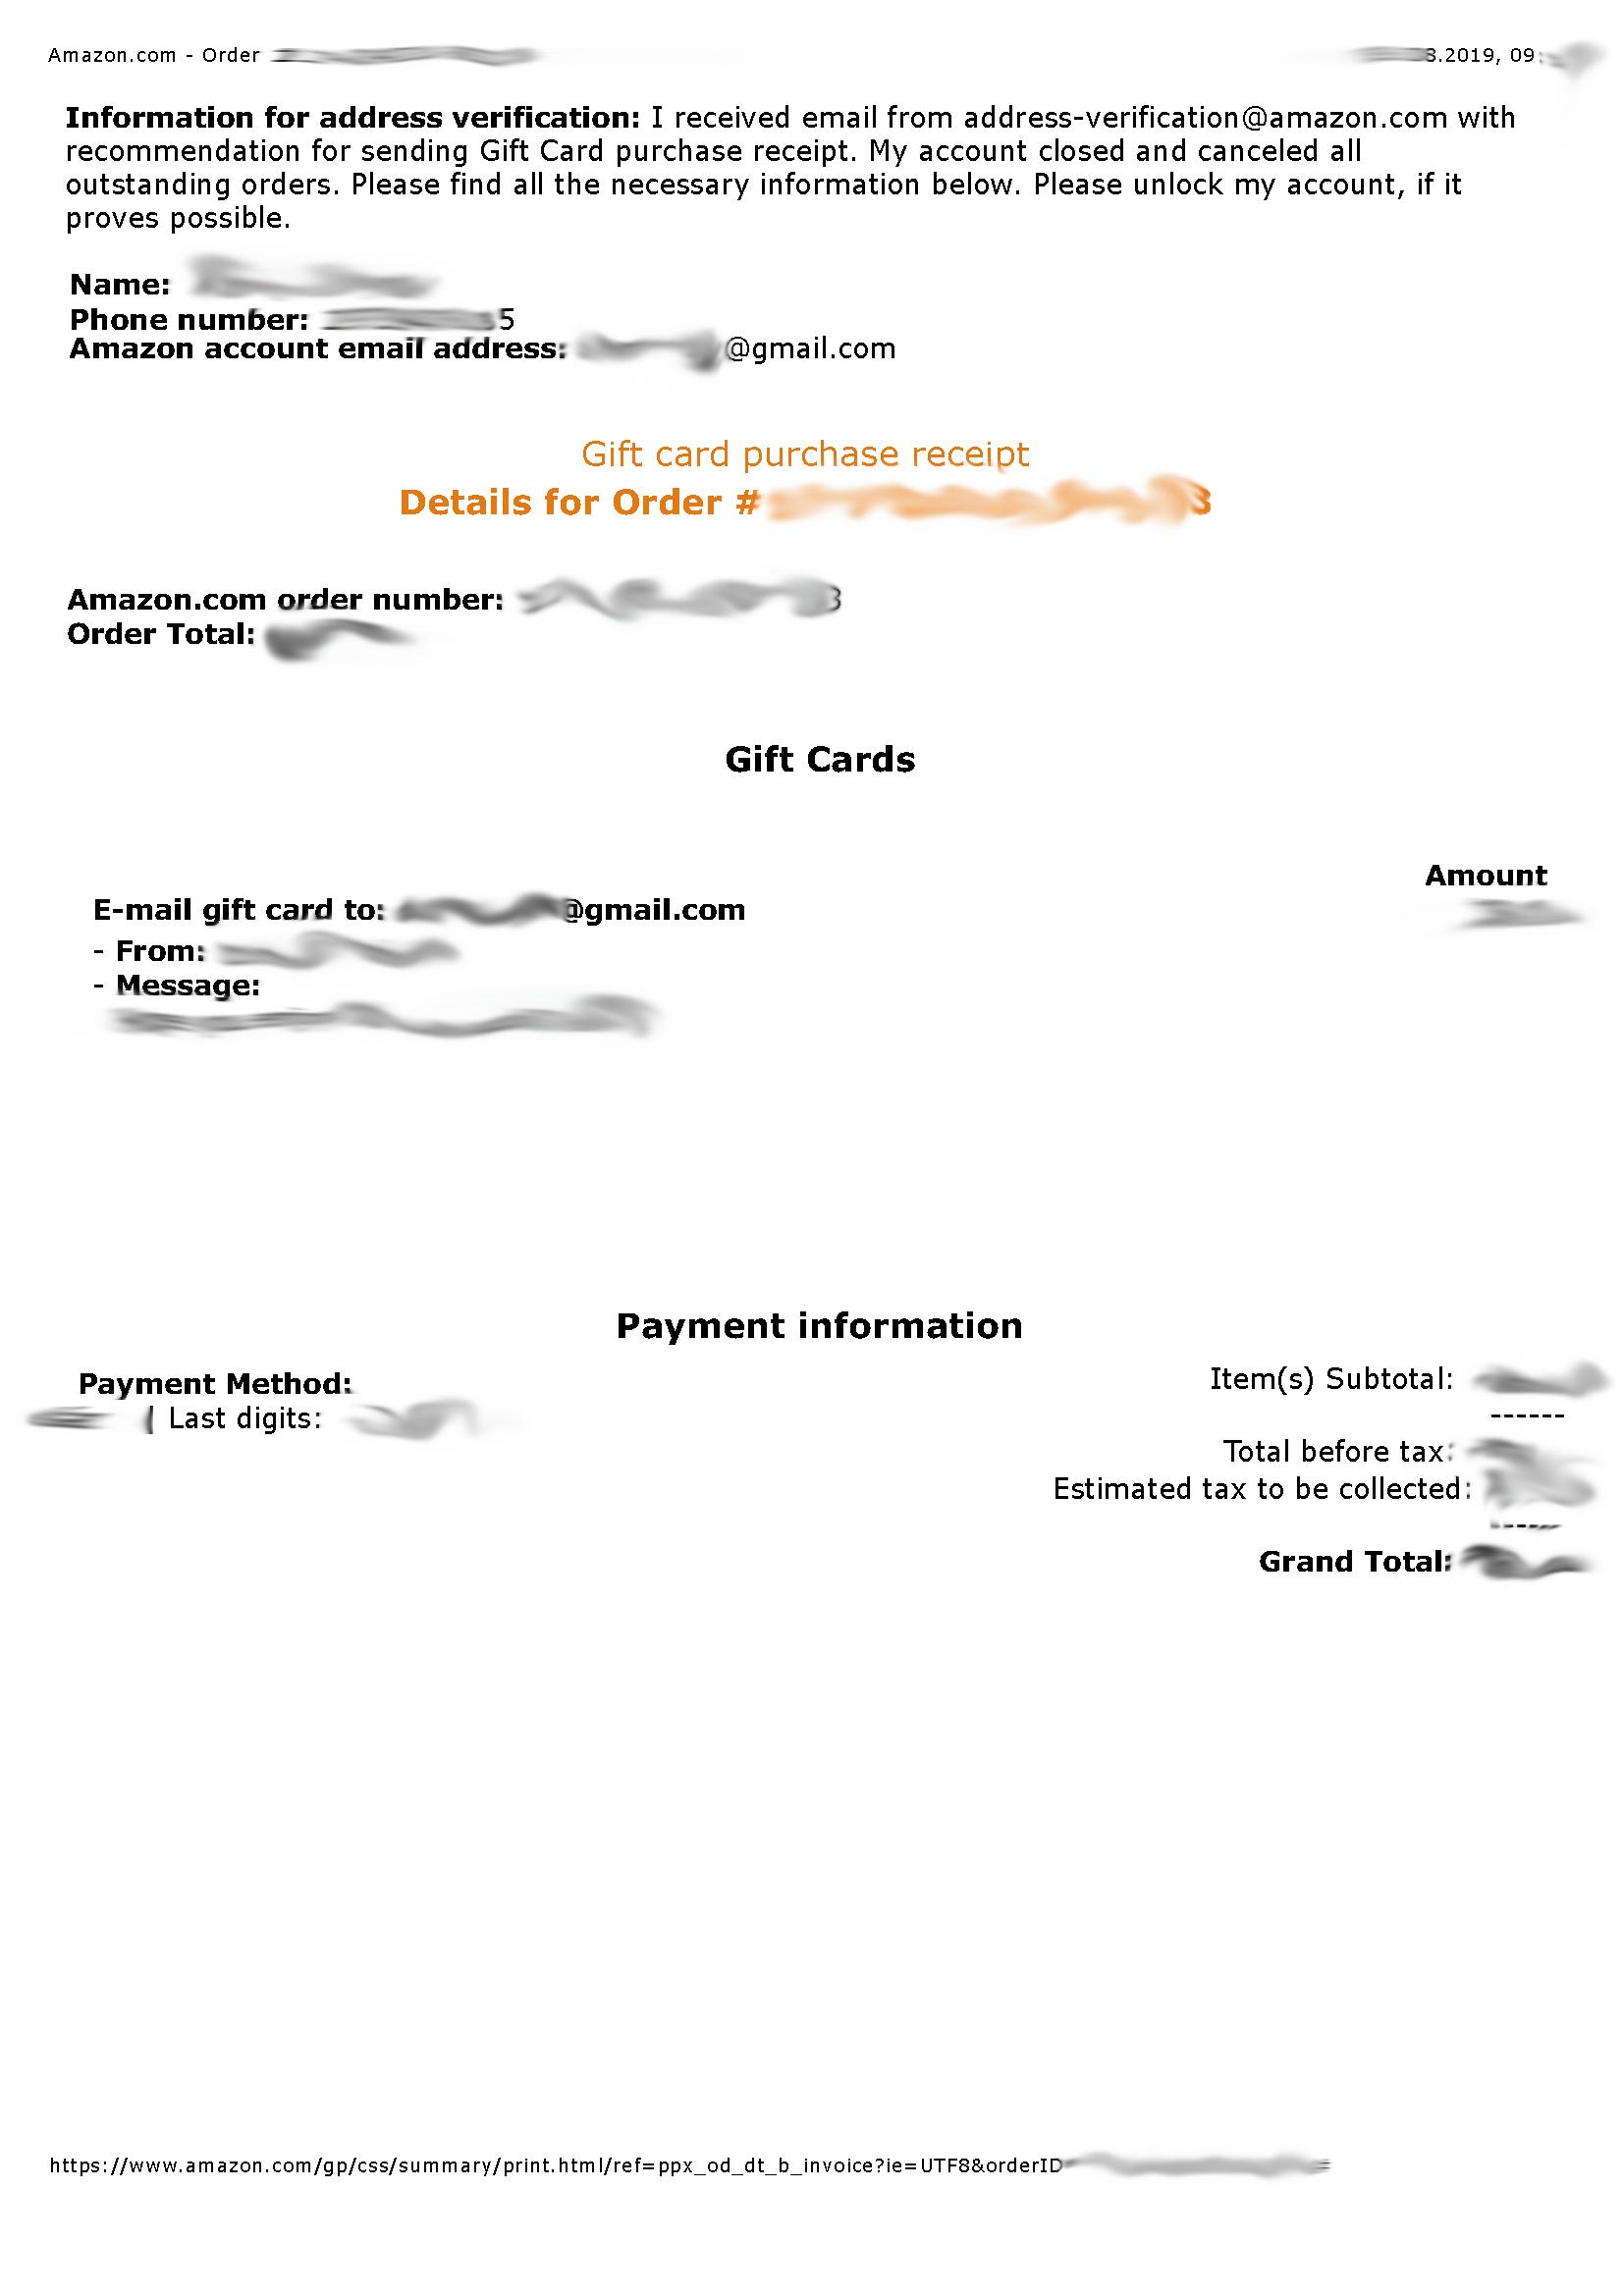 amazon-com-order-114-8341031-8032263-png.388484